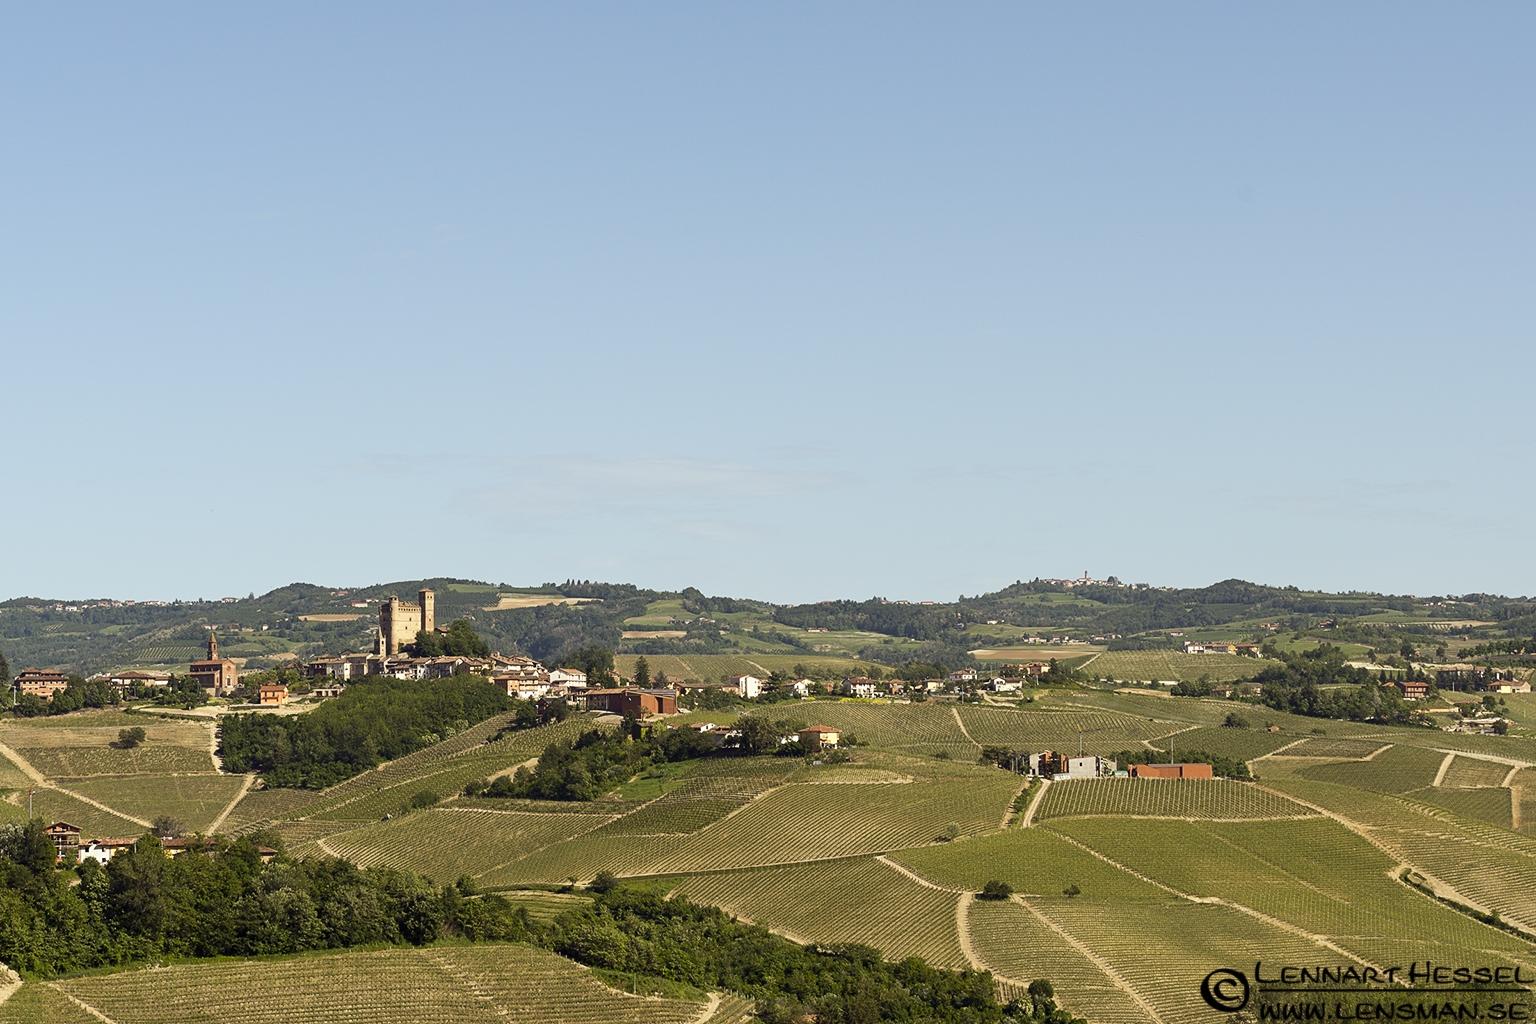 Serralunga d'Alba in Piedmont, Italy